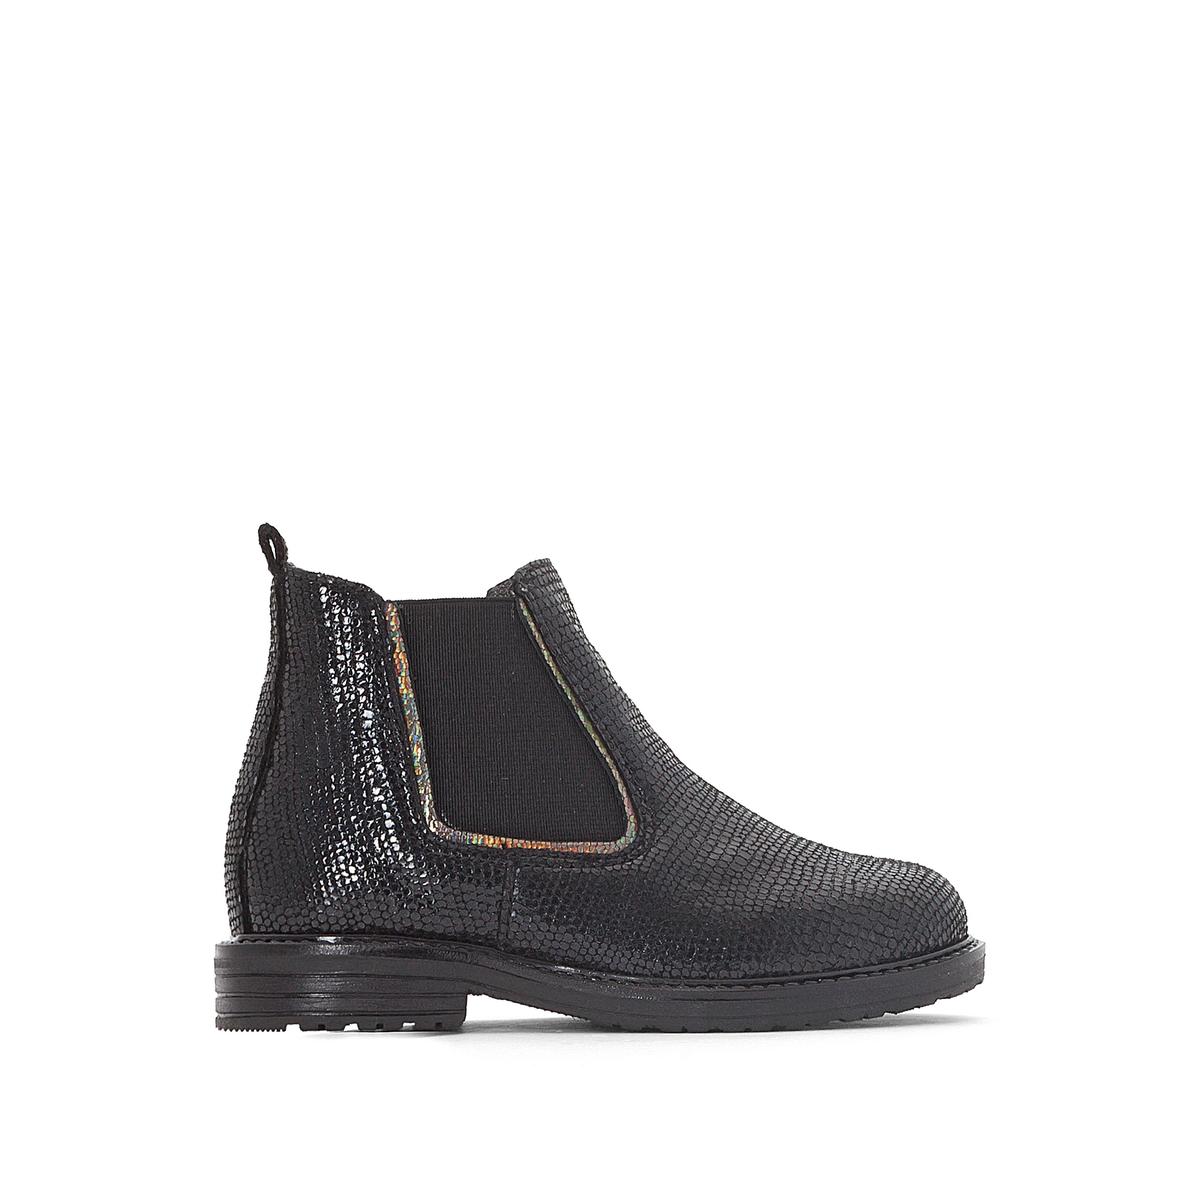 Ботинки-челси кожаные Salouna ботинки челси кожаные holton